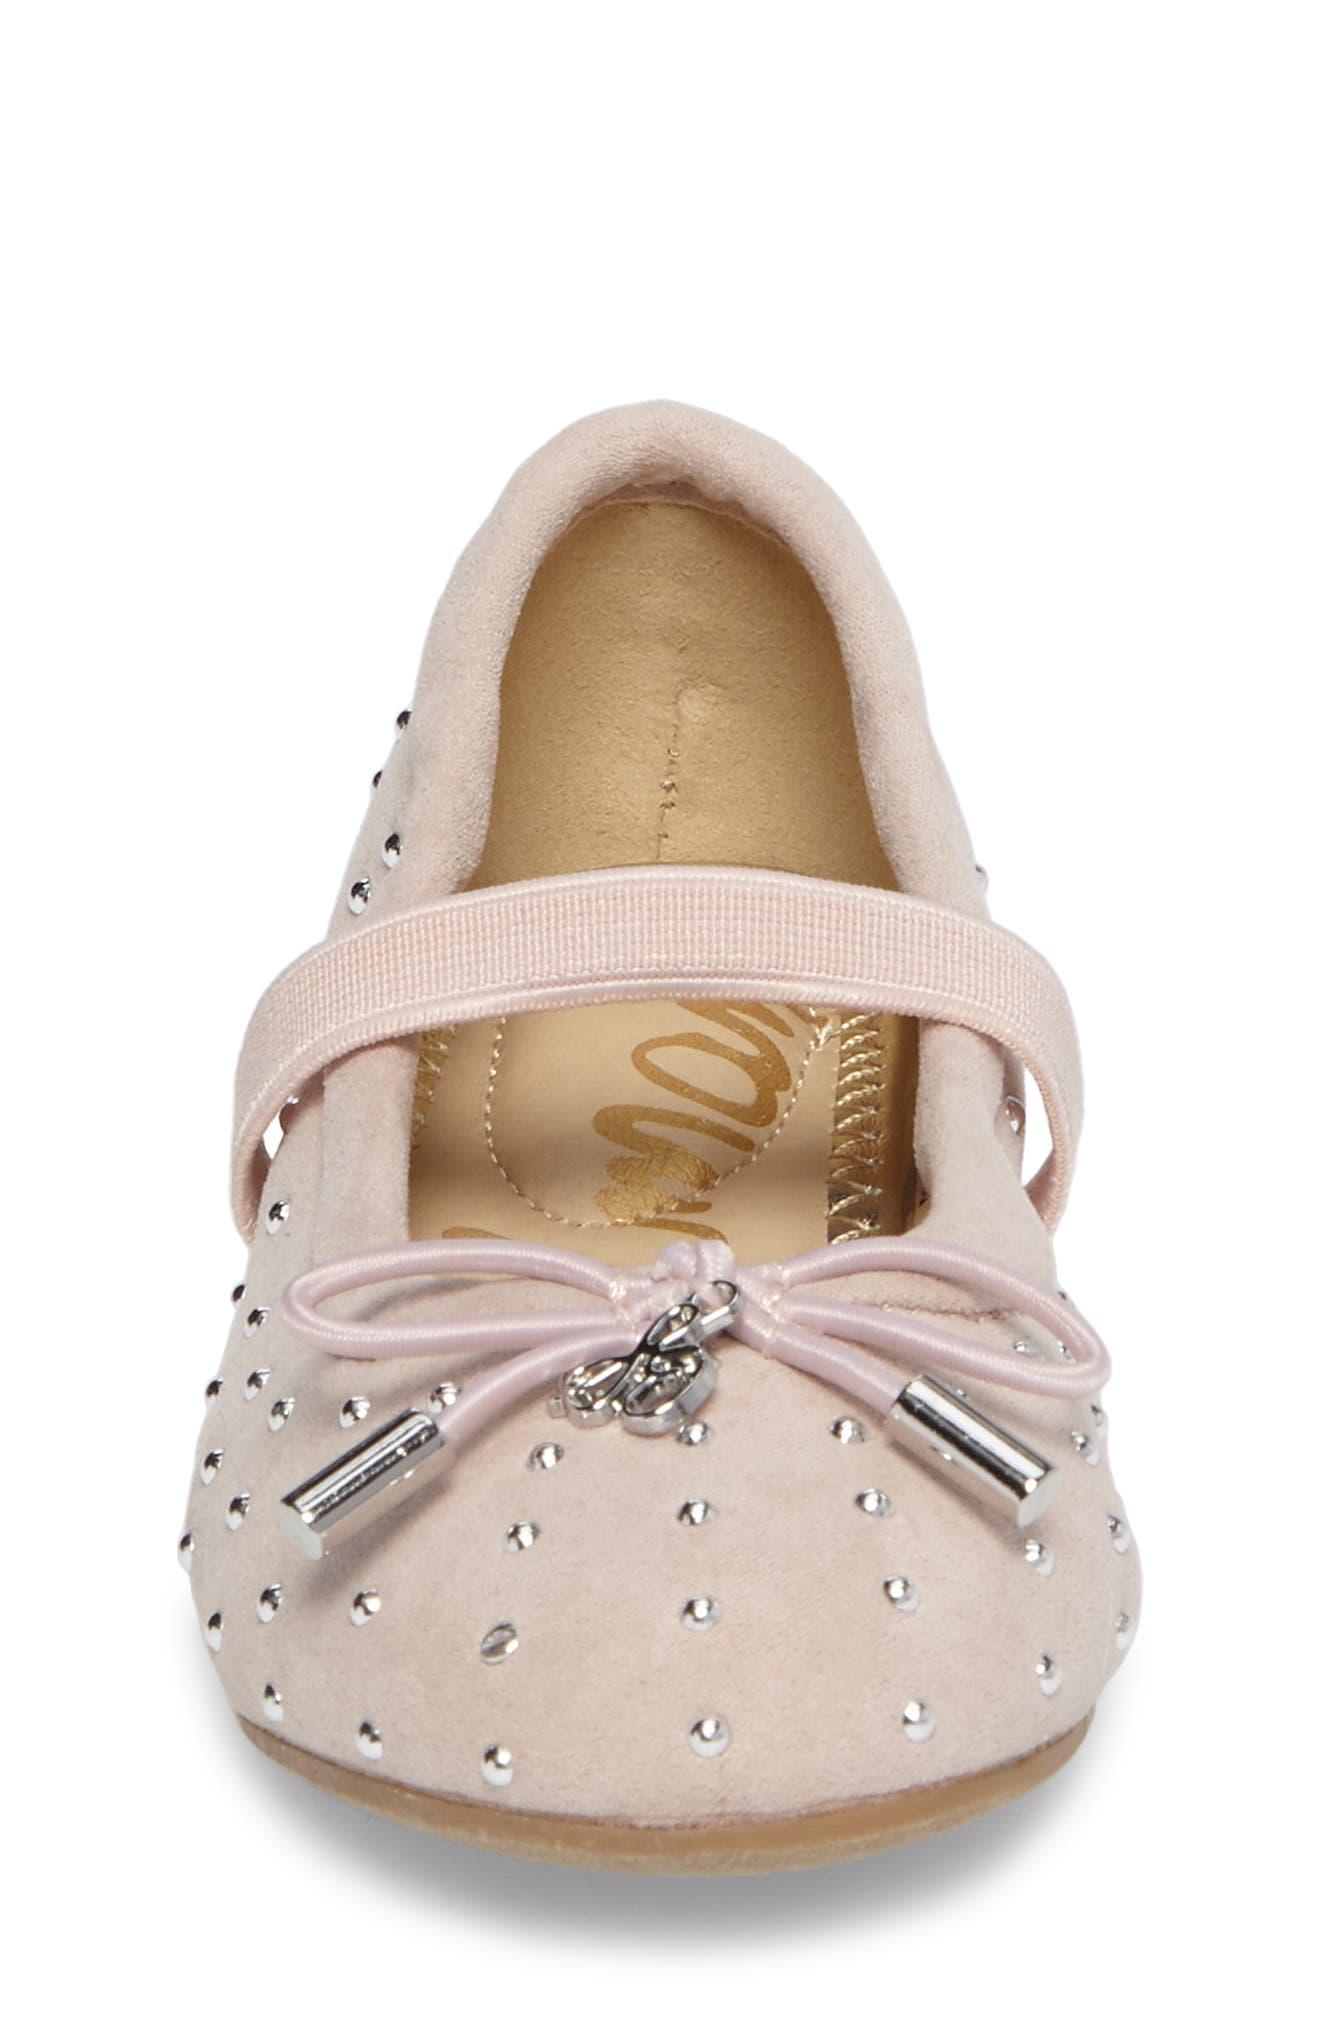 Felicia Ballet Flats,                             Alternate thumbnail 4, color,                             652